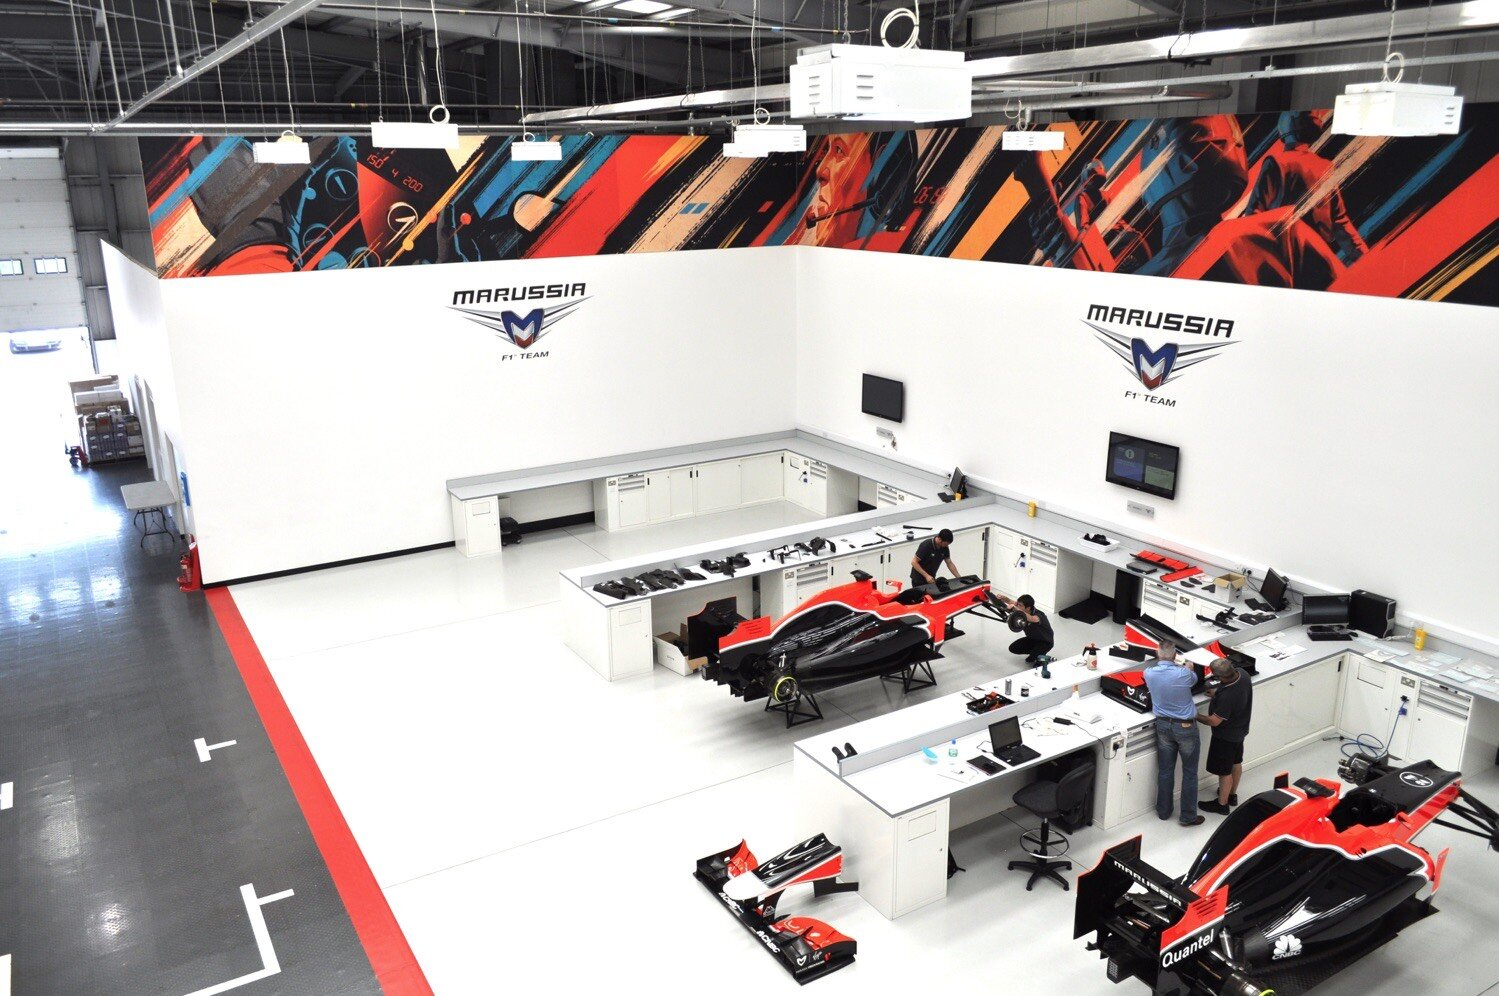 tavis-coburn-F1-team-graphic-illustration-marussia-25.jpg